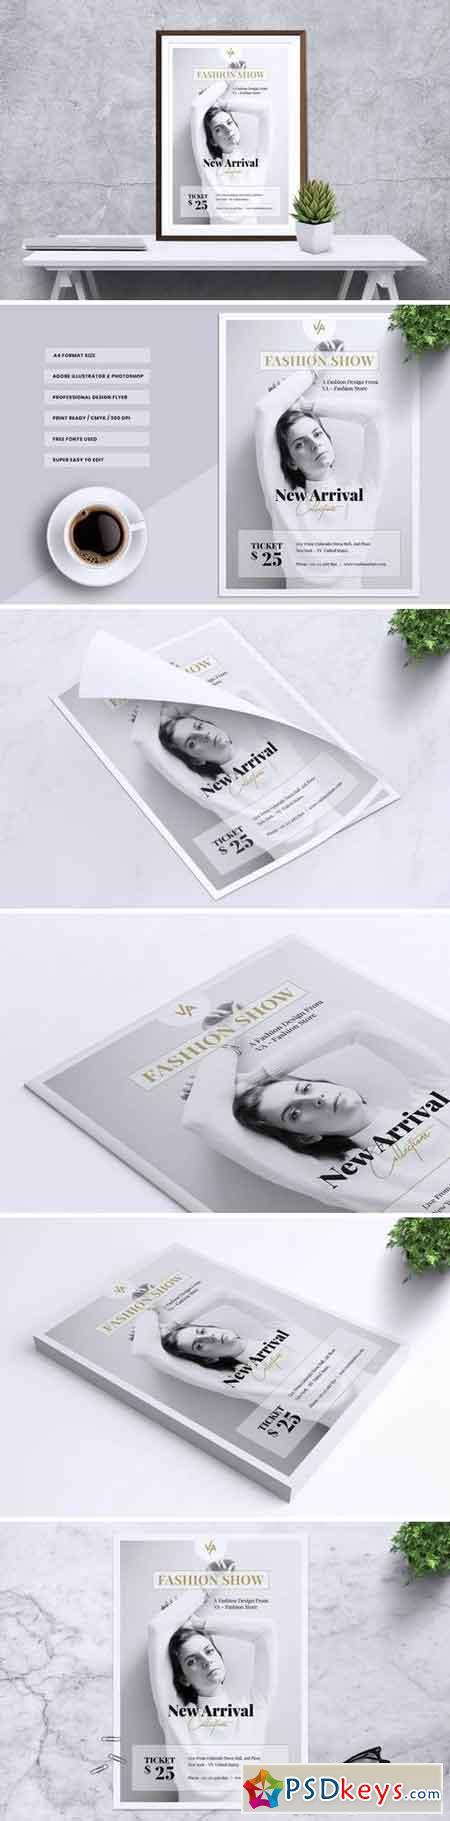 VA Fashion Show Flyer